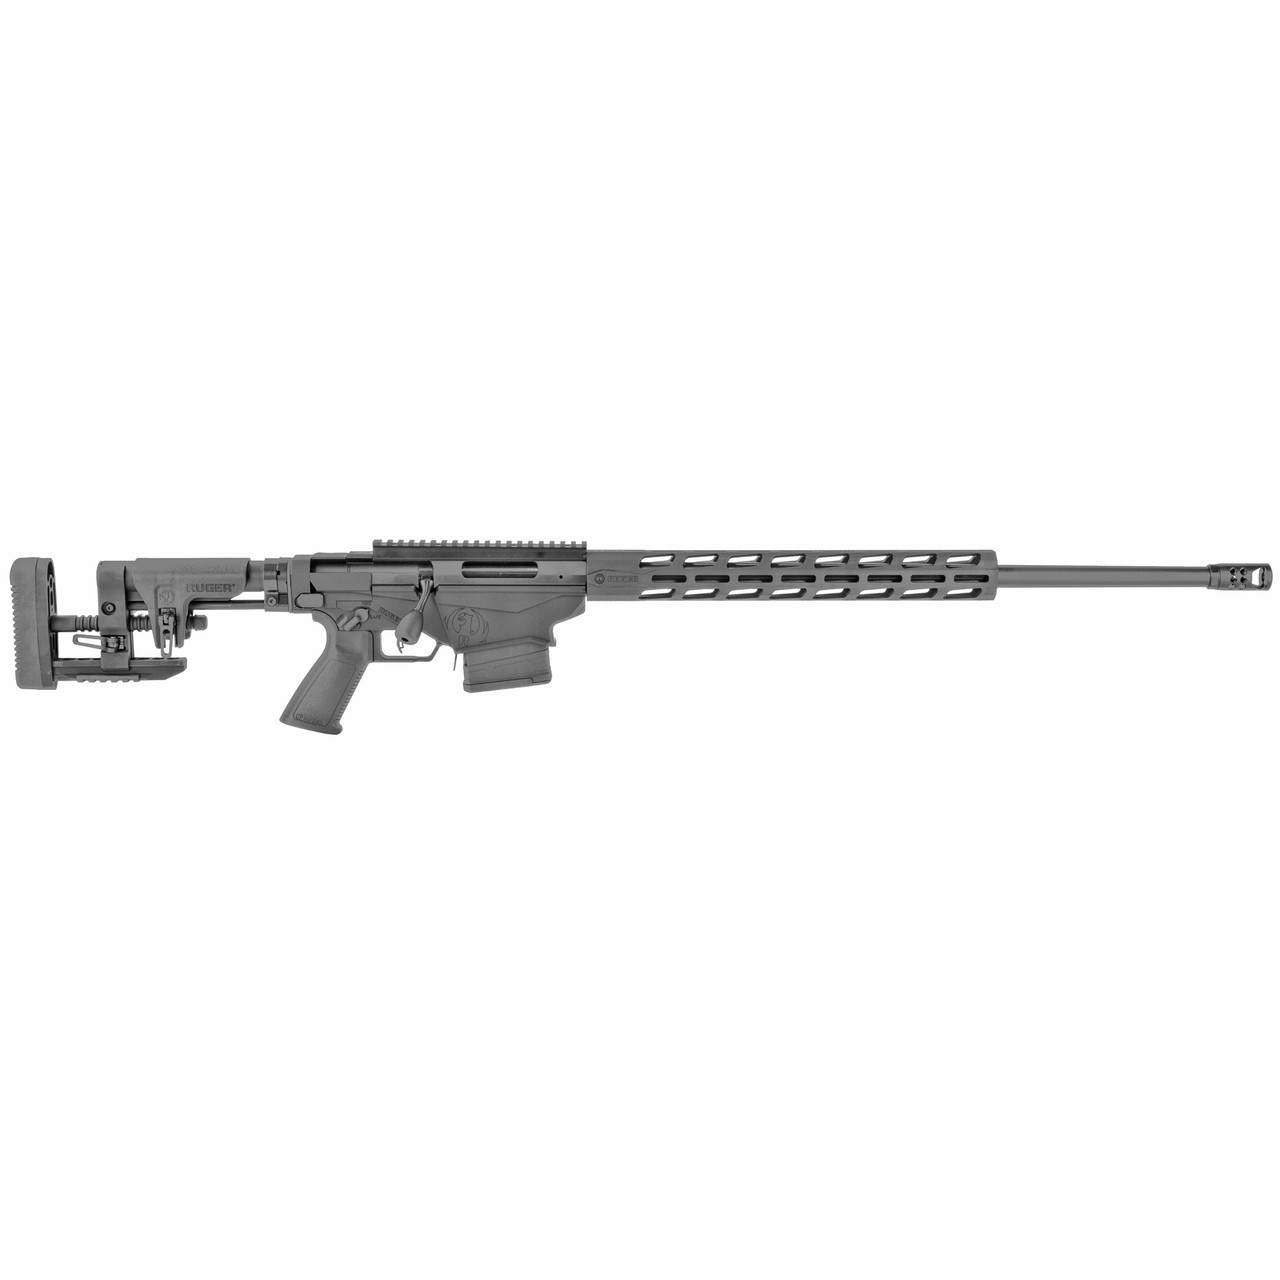 Ruger Precision Rifle CALIFORNIA LEGAL - 6.5 Creedmoor